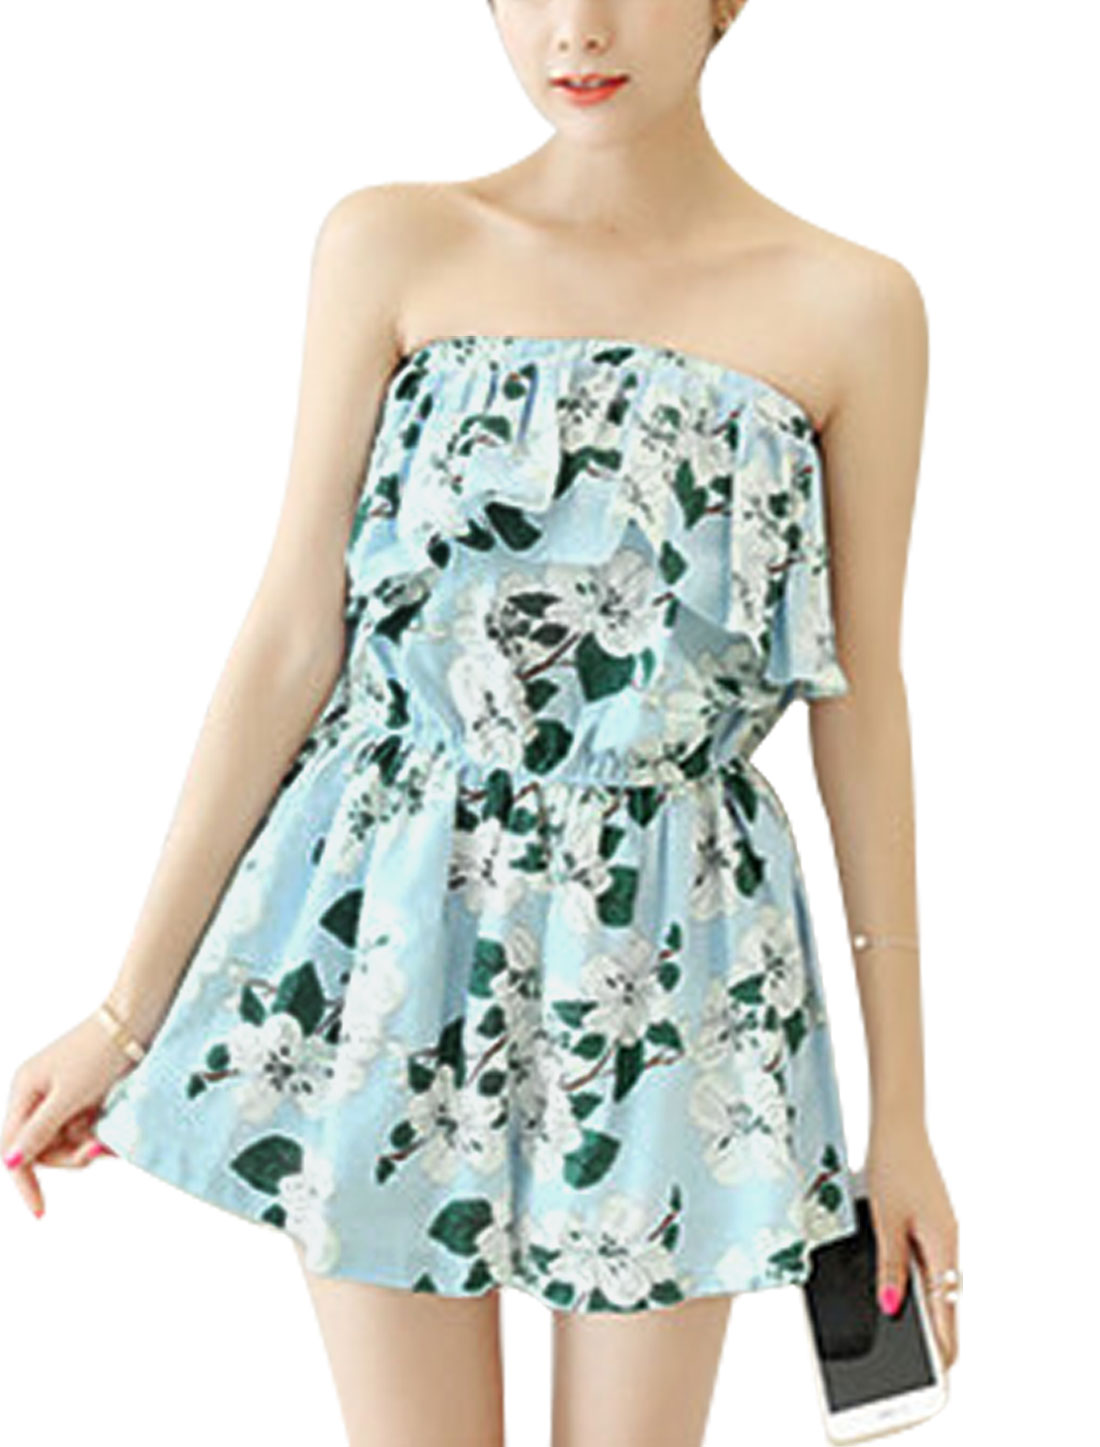 Woman Floral Prints Strapless Elastic Waist Chiffon Playsuit Light Blue XS